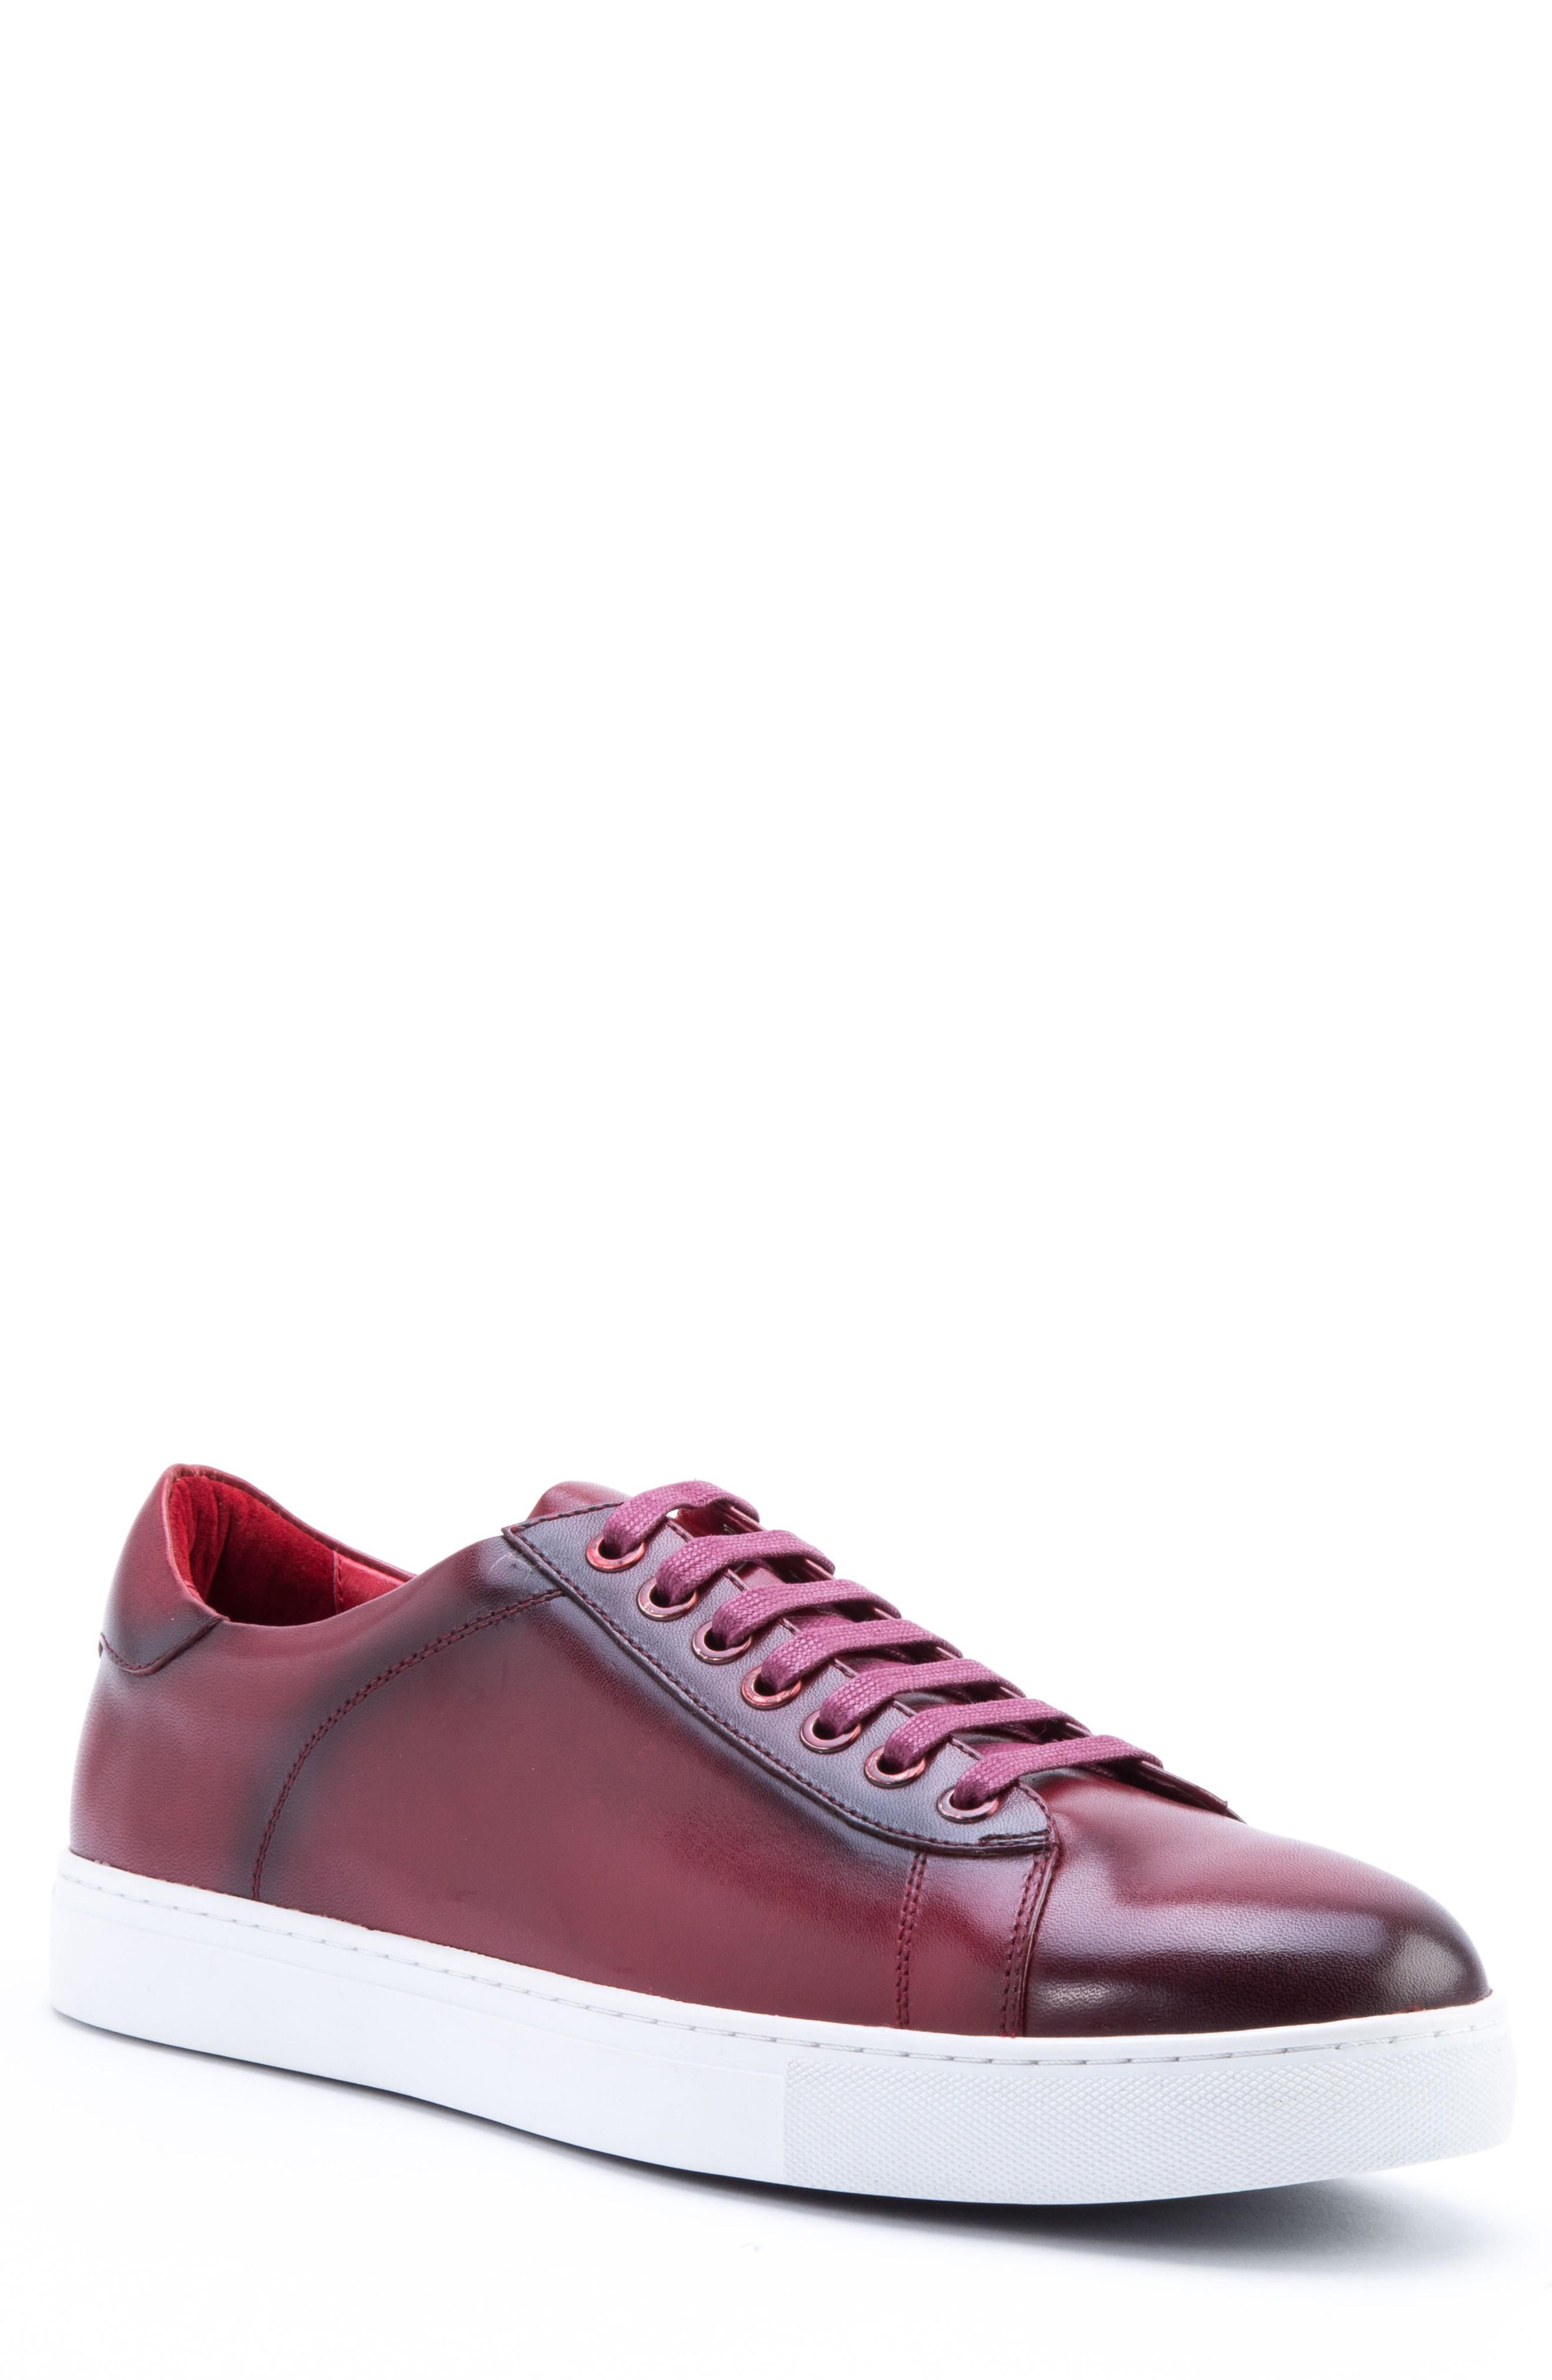 Zanzara Music Low Top Sneaker In Red Leather